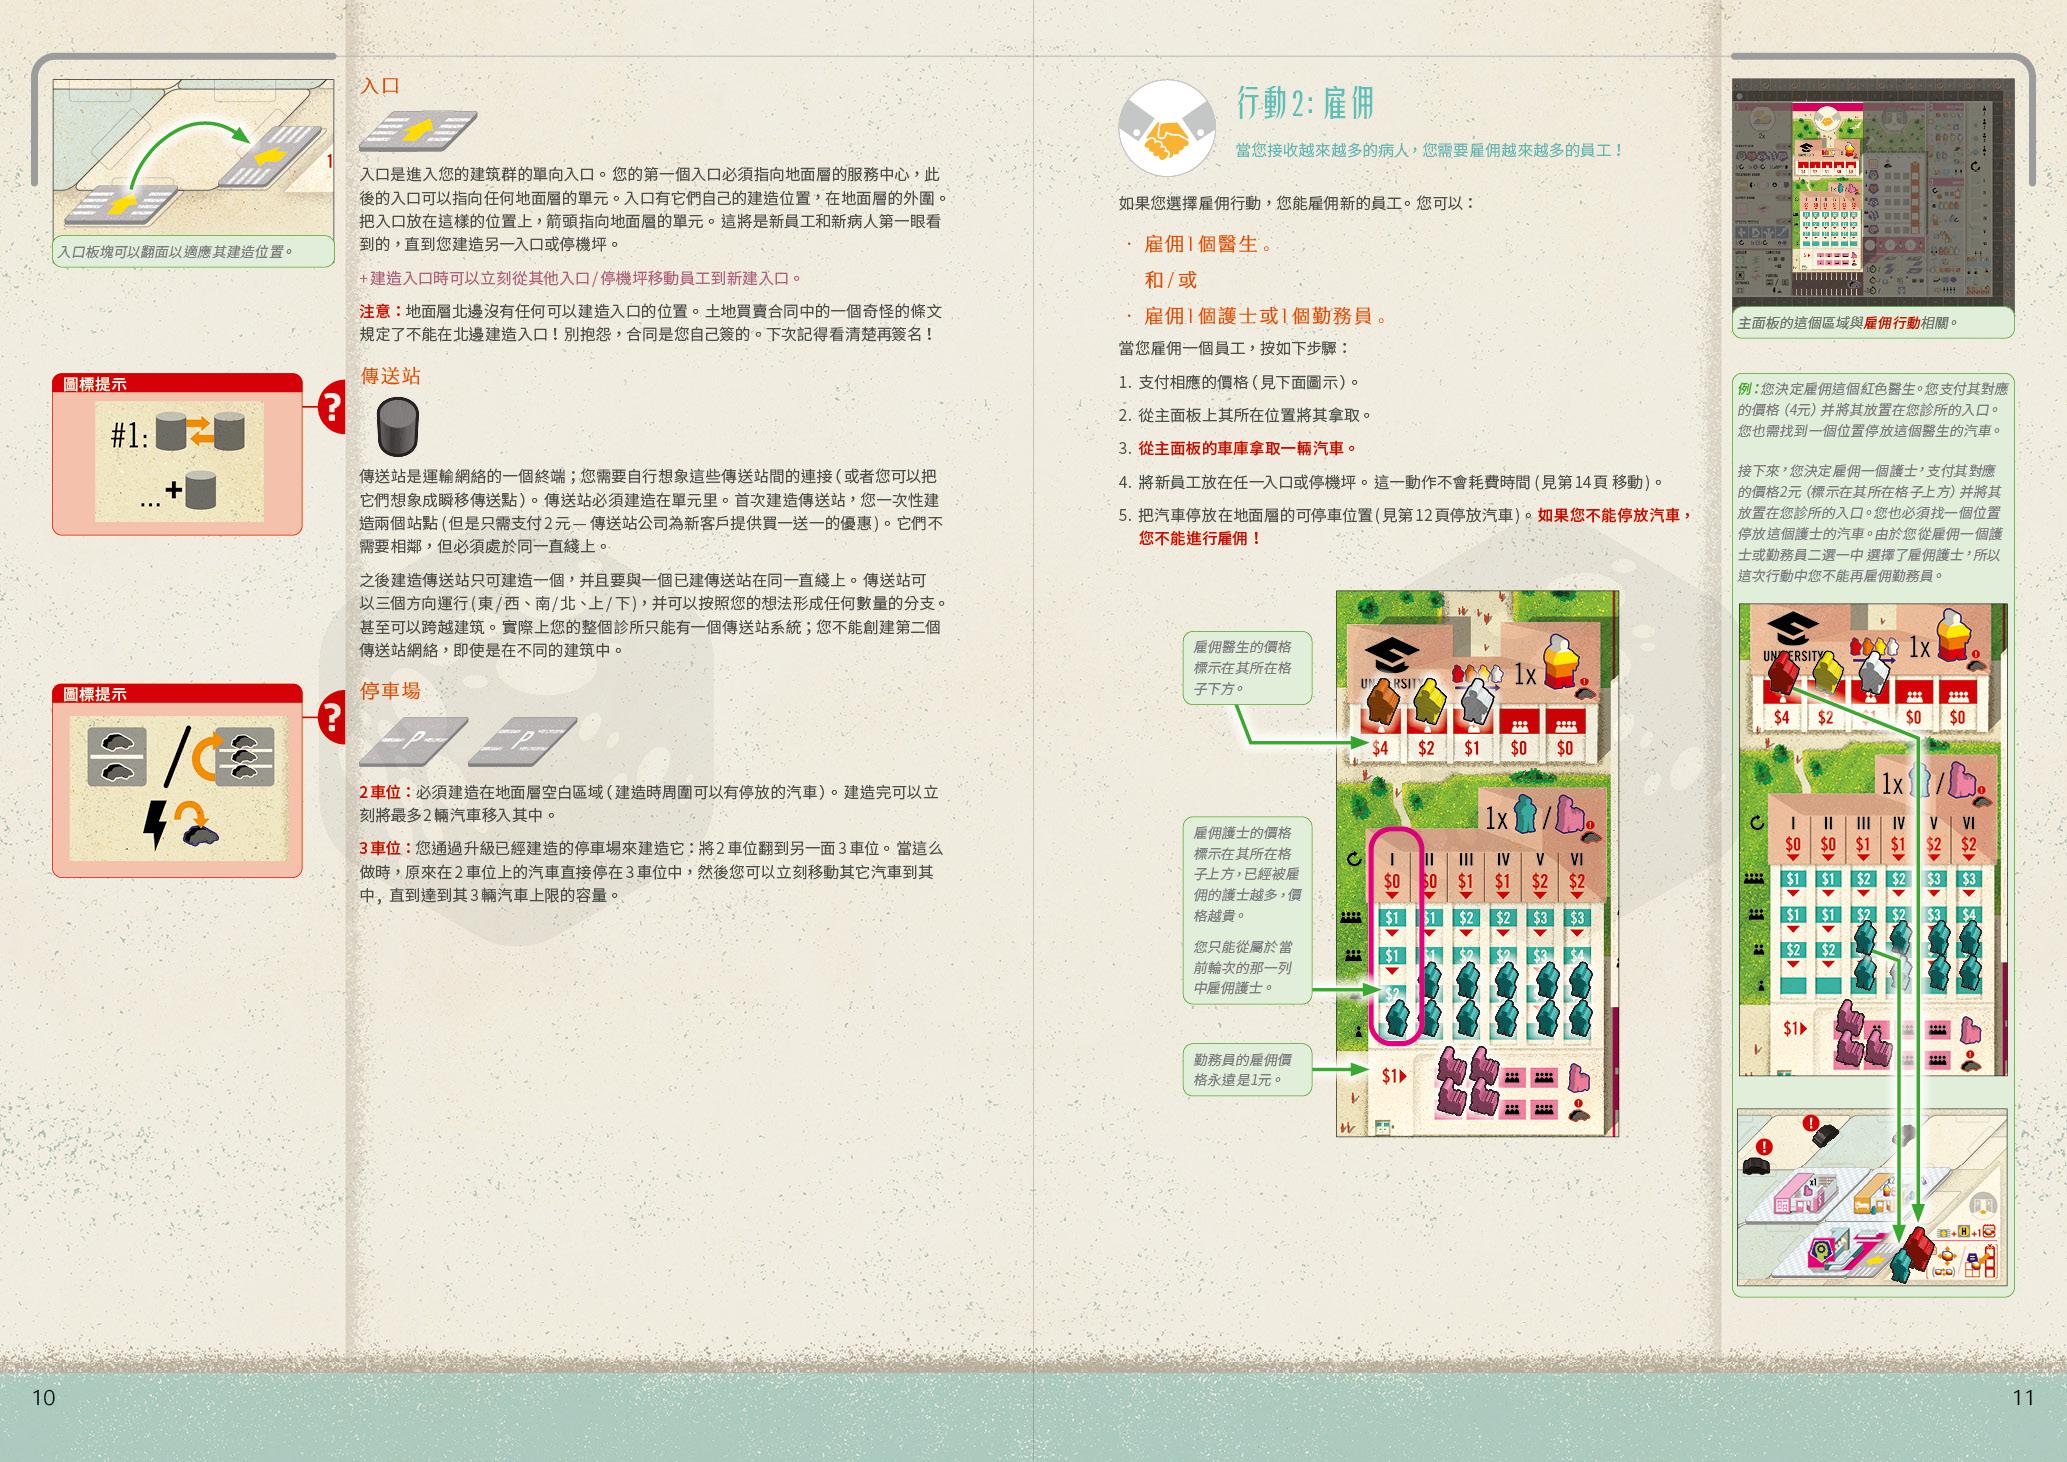 Clinic rules cn sample2.jpg